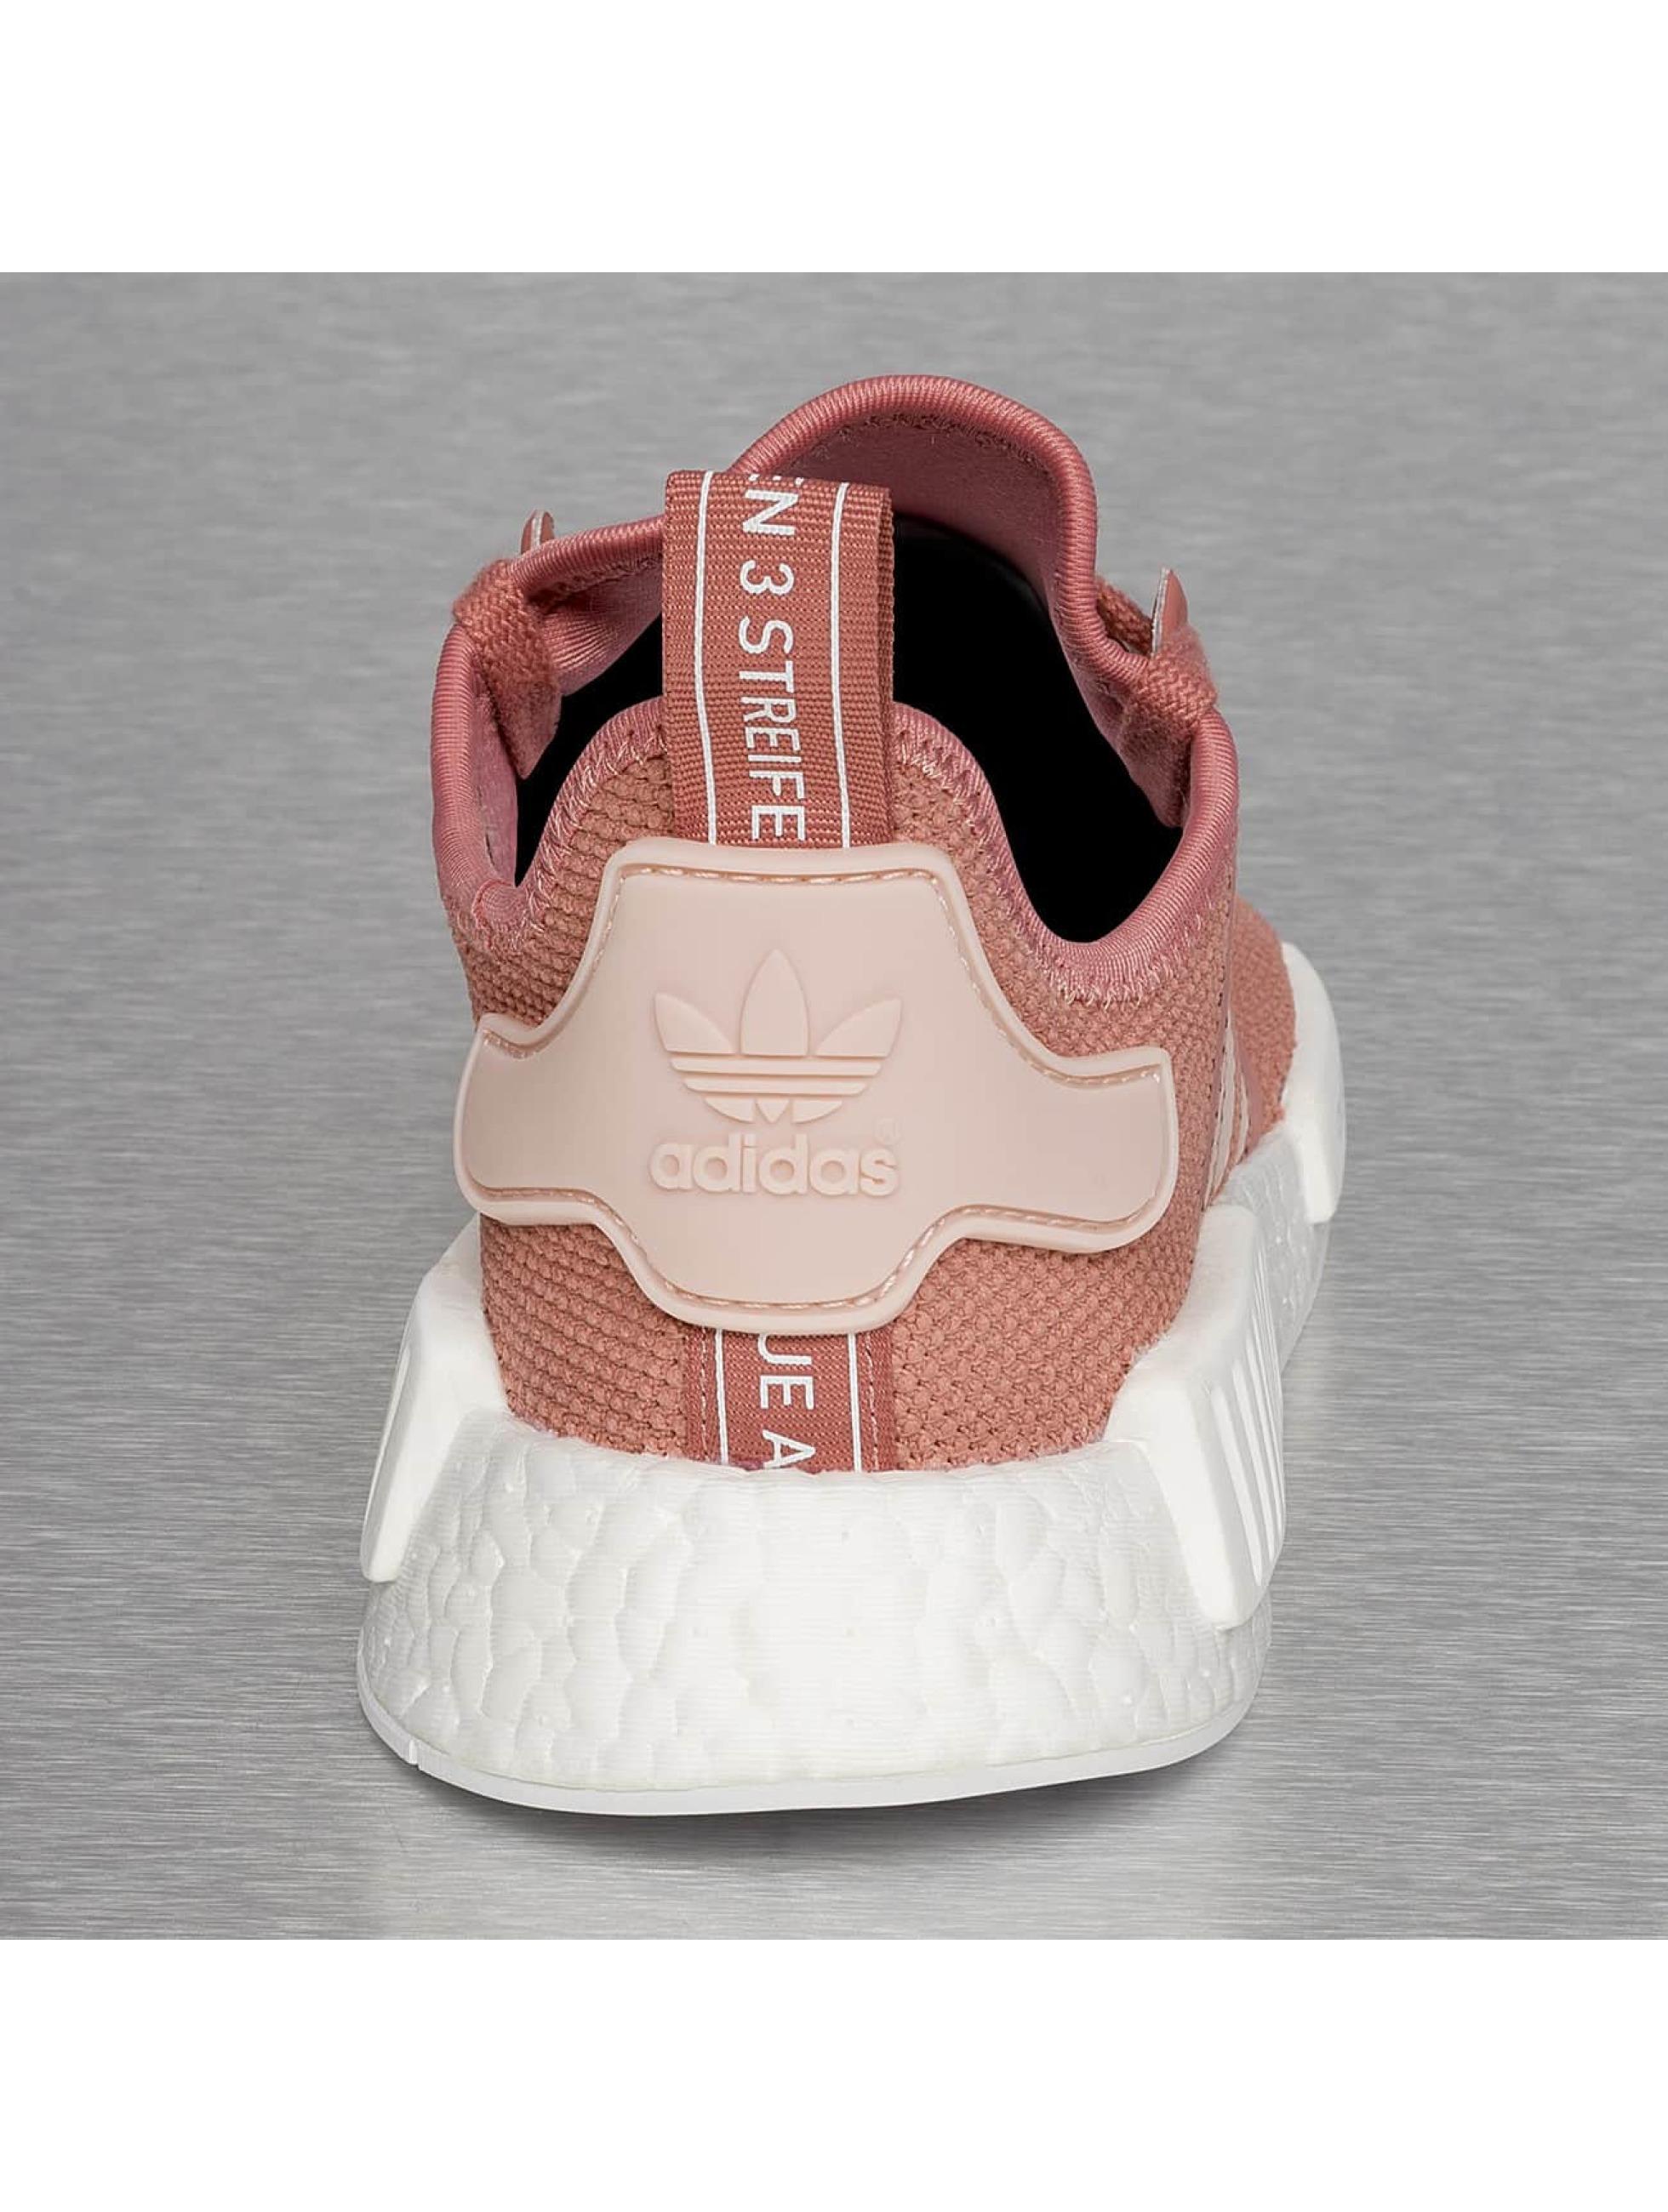 Adidas Nmd R1 Raw Pink Kaufen